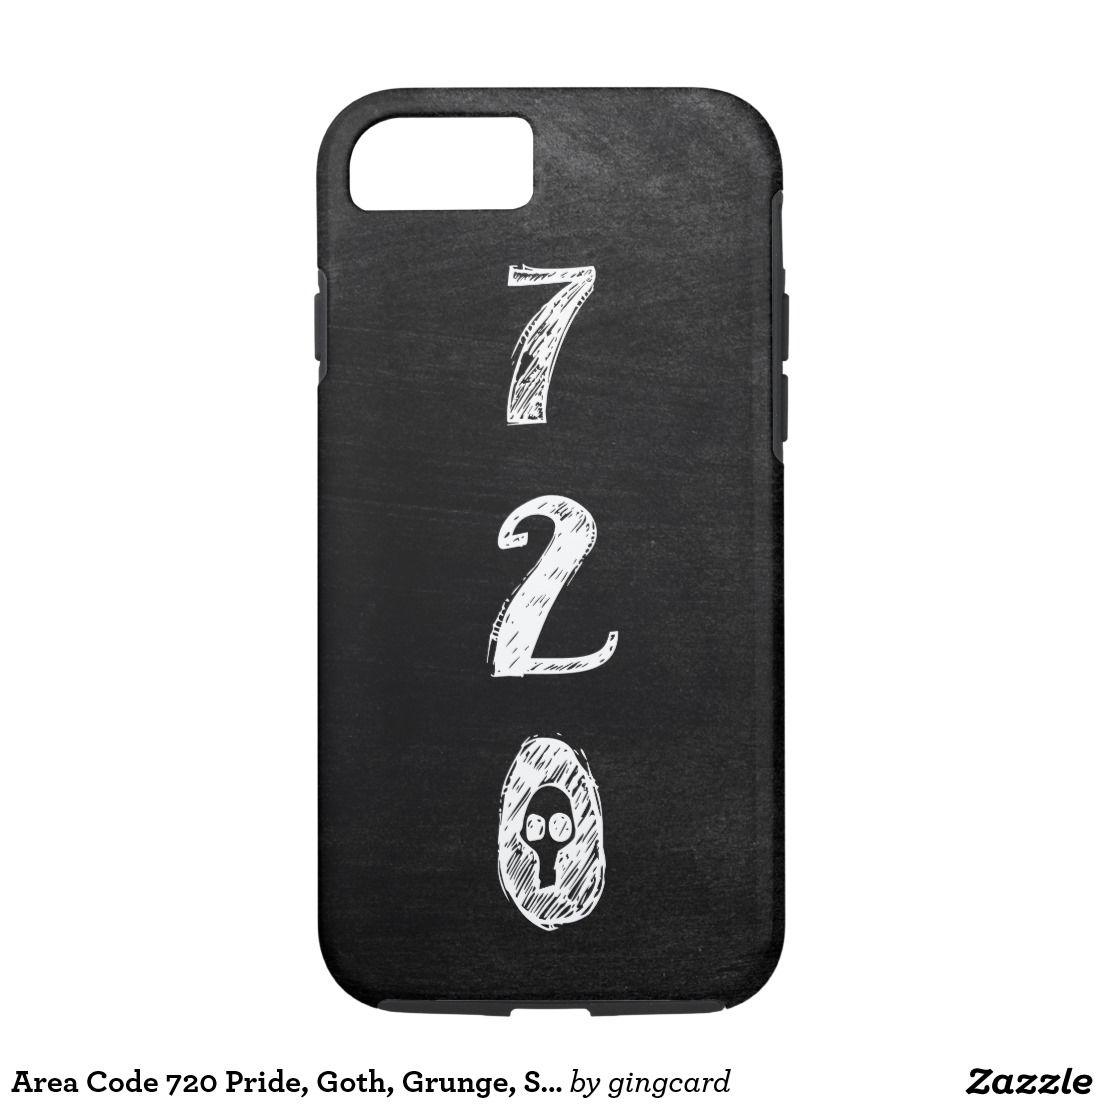 Grunge Skull iphone 11 case